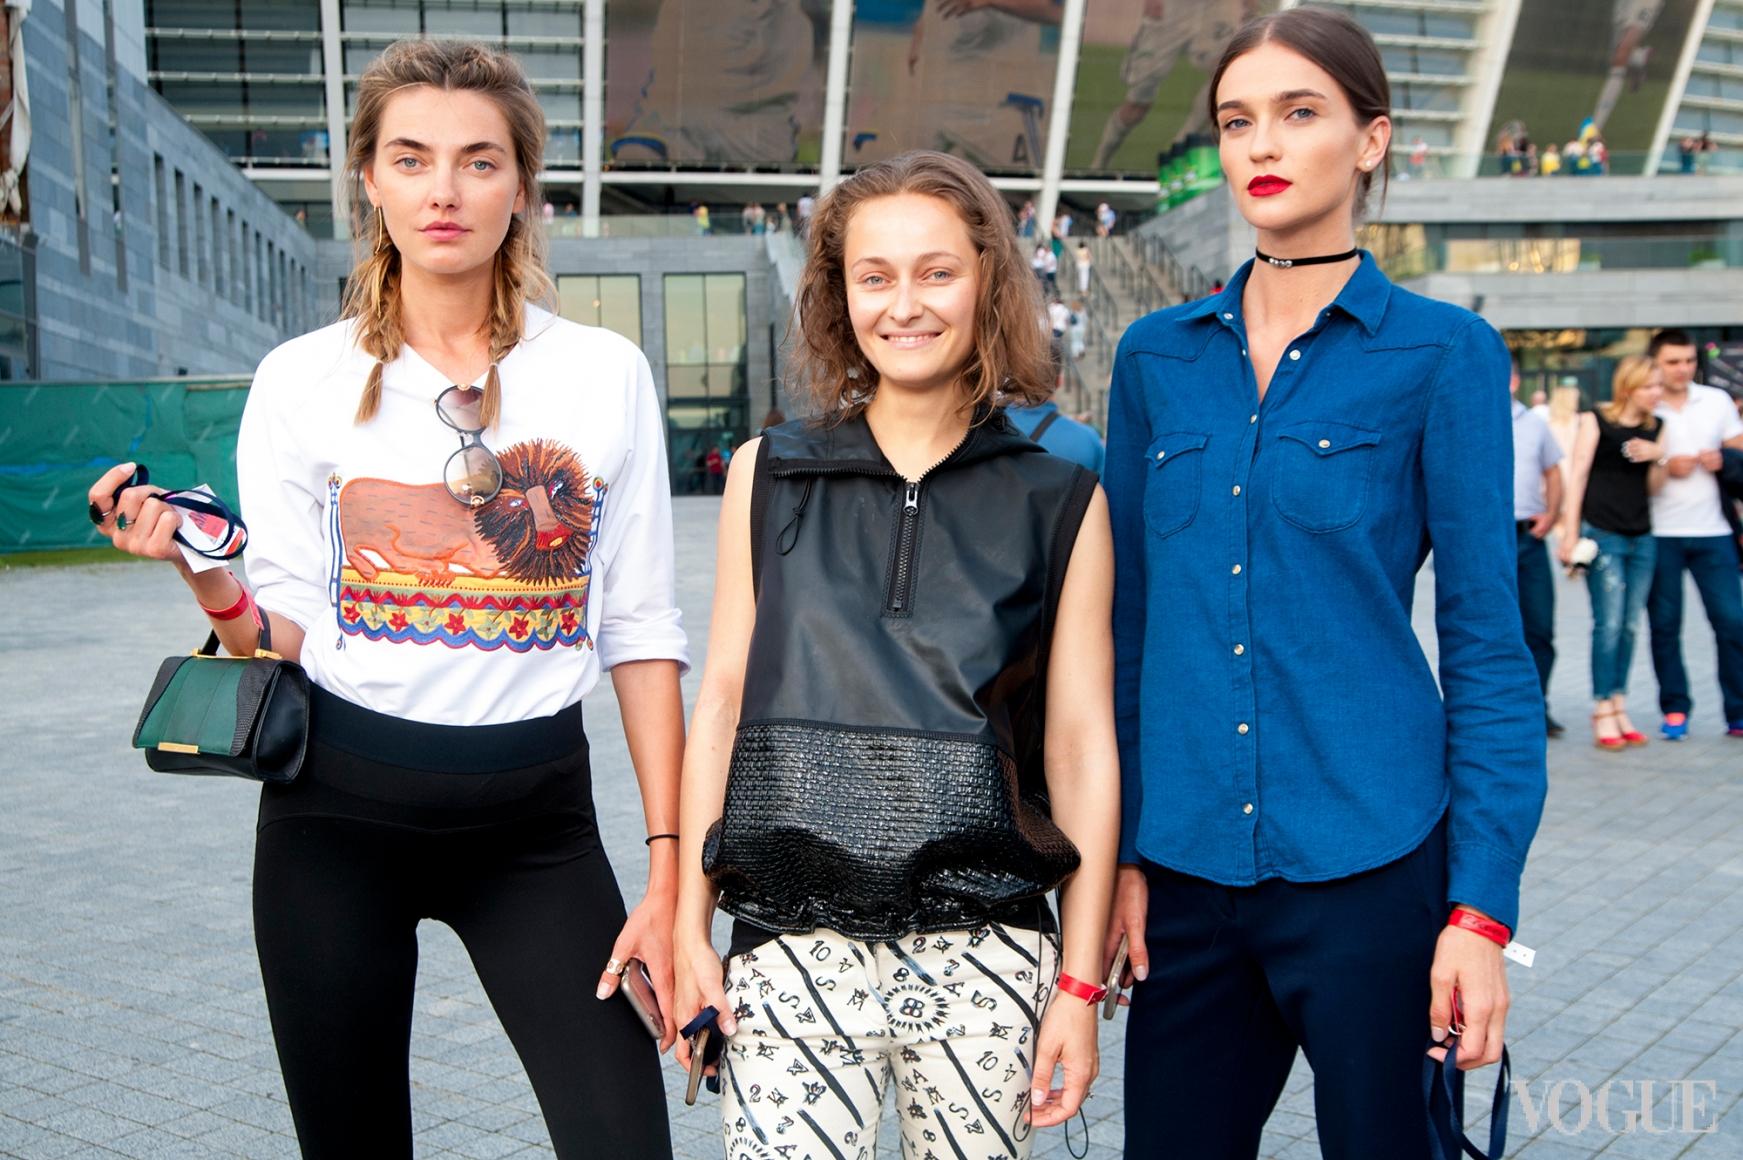 Алина Байкова, Дарья Шаповалова и Элла Кандыба